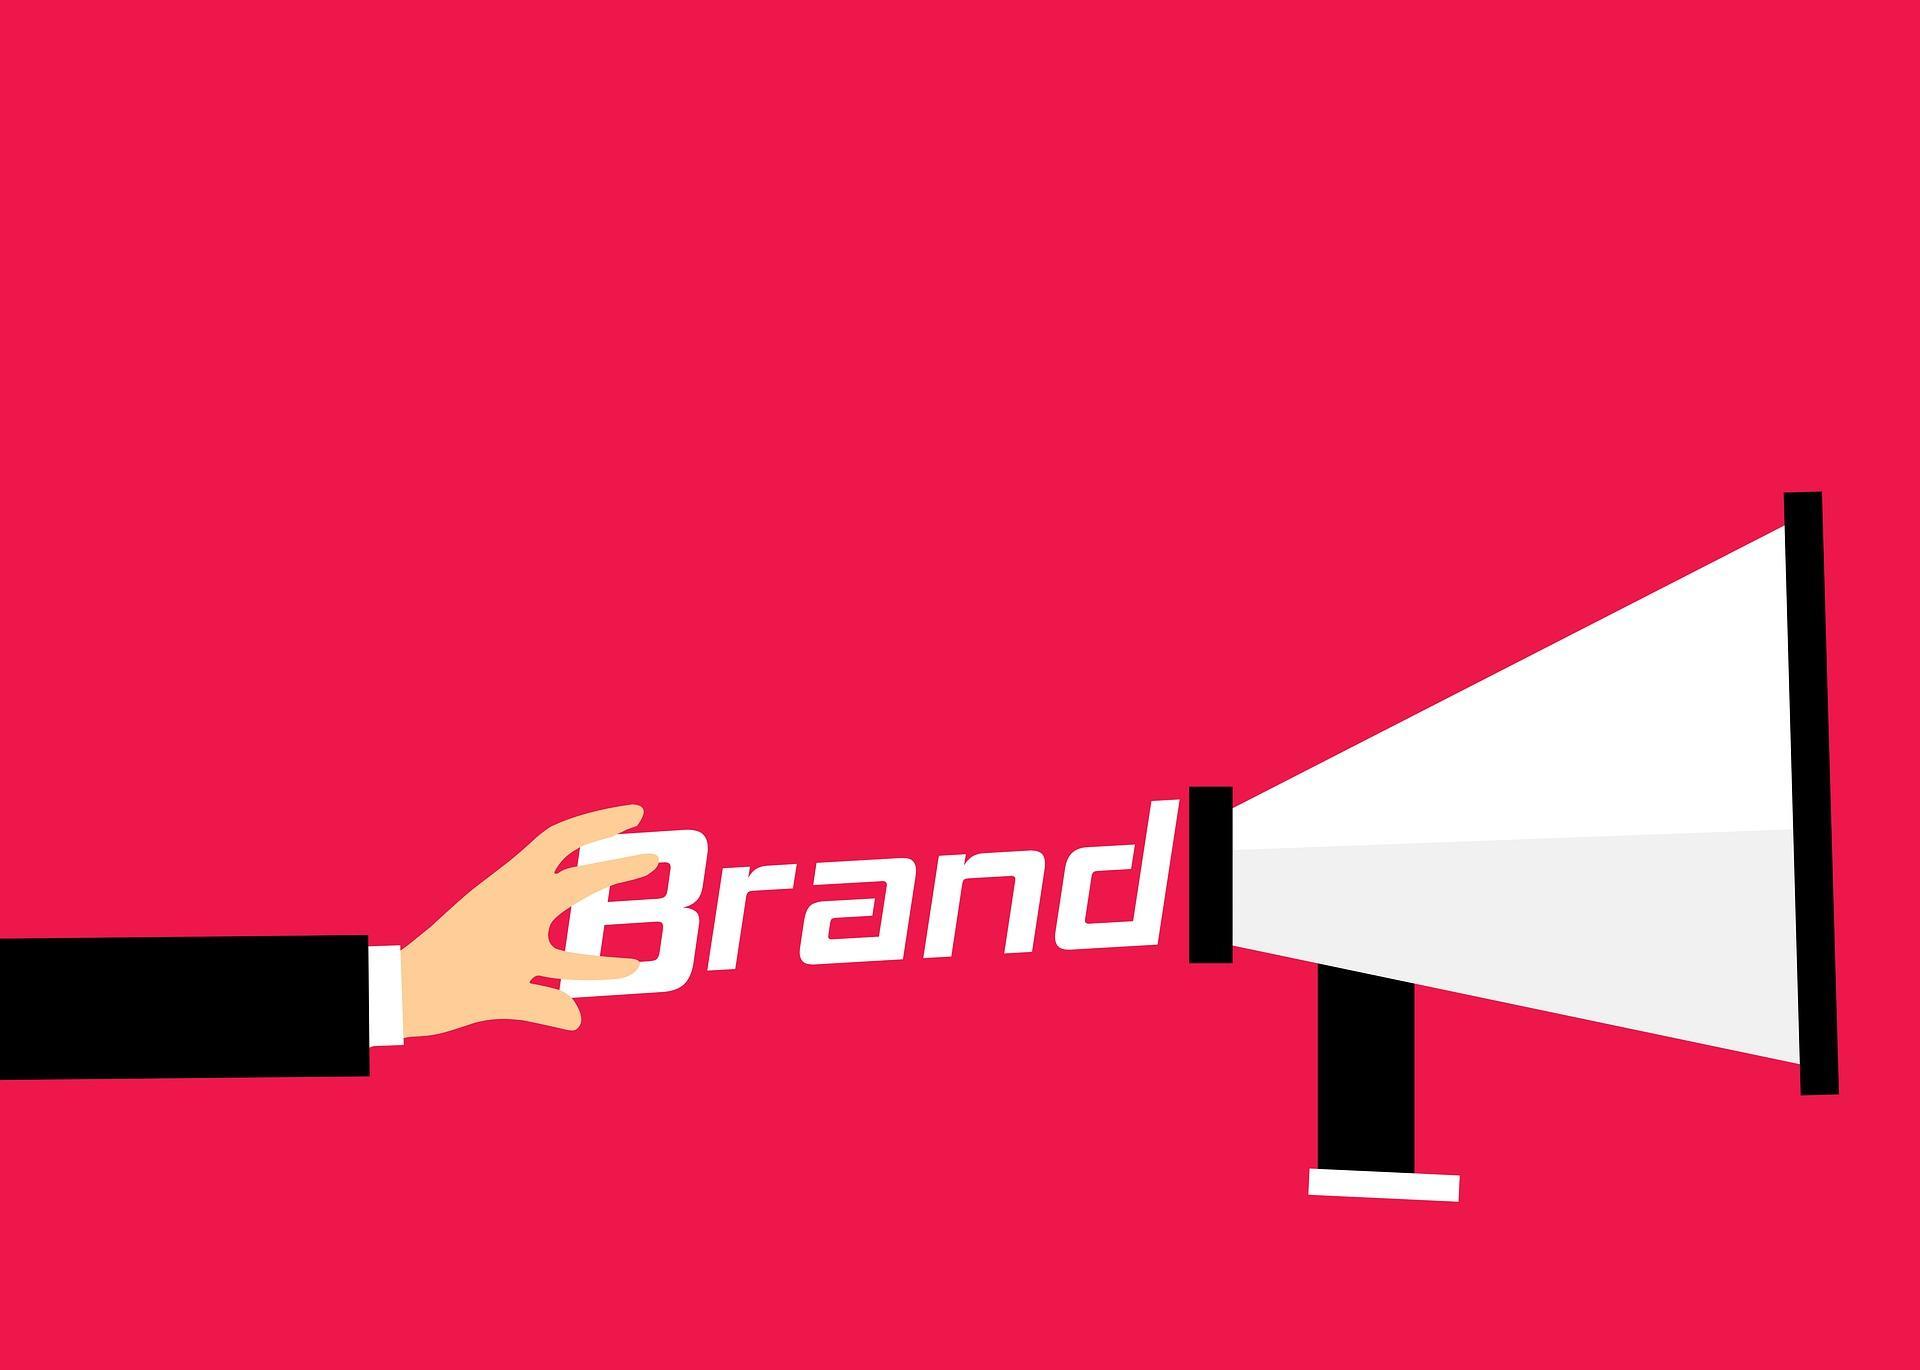 C:\Users\Admin\Downloads\brand-marketing-4297062_1920.jpg